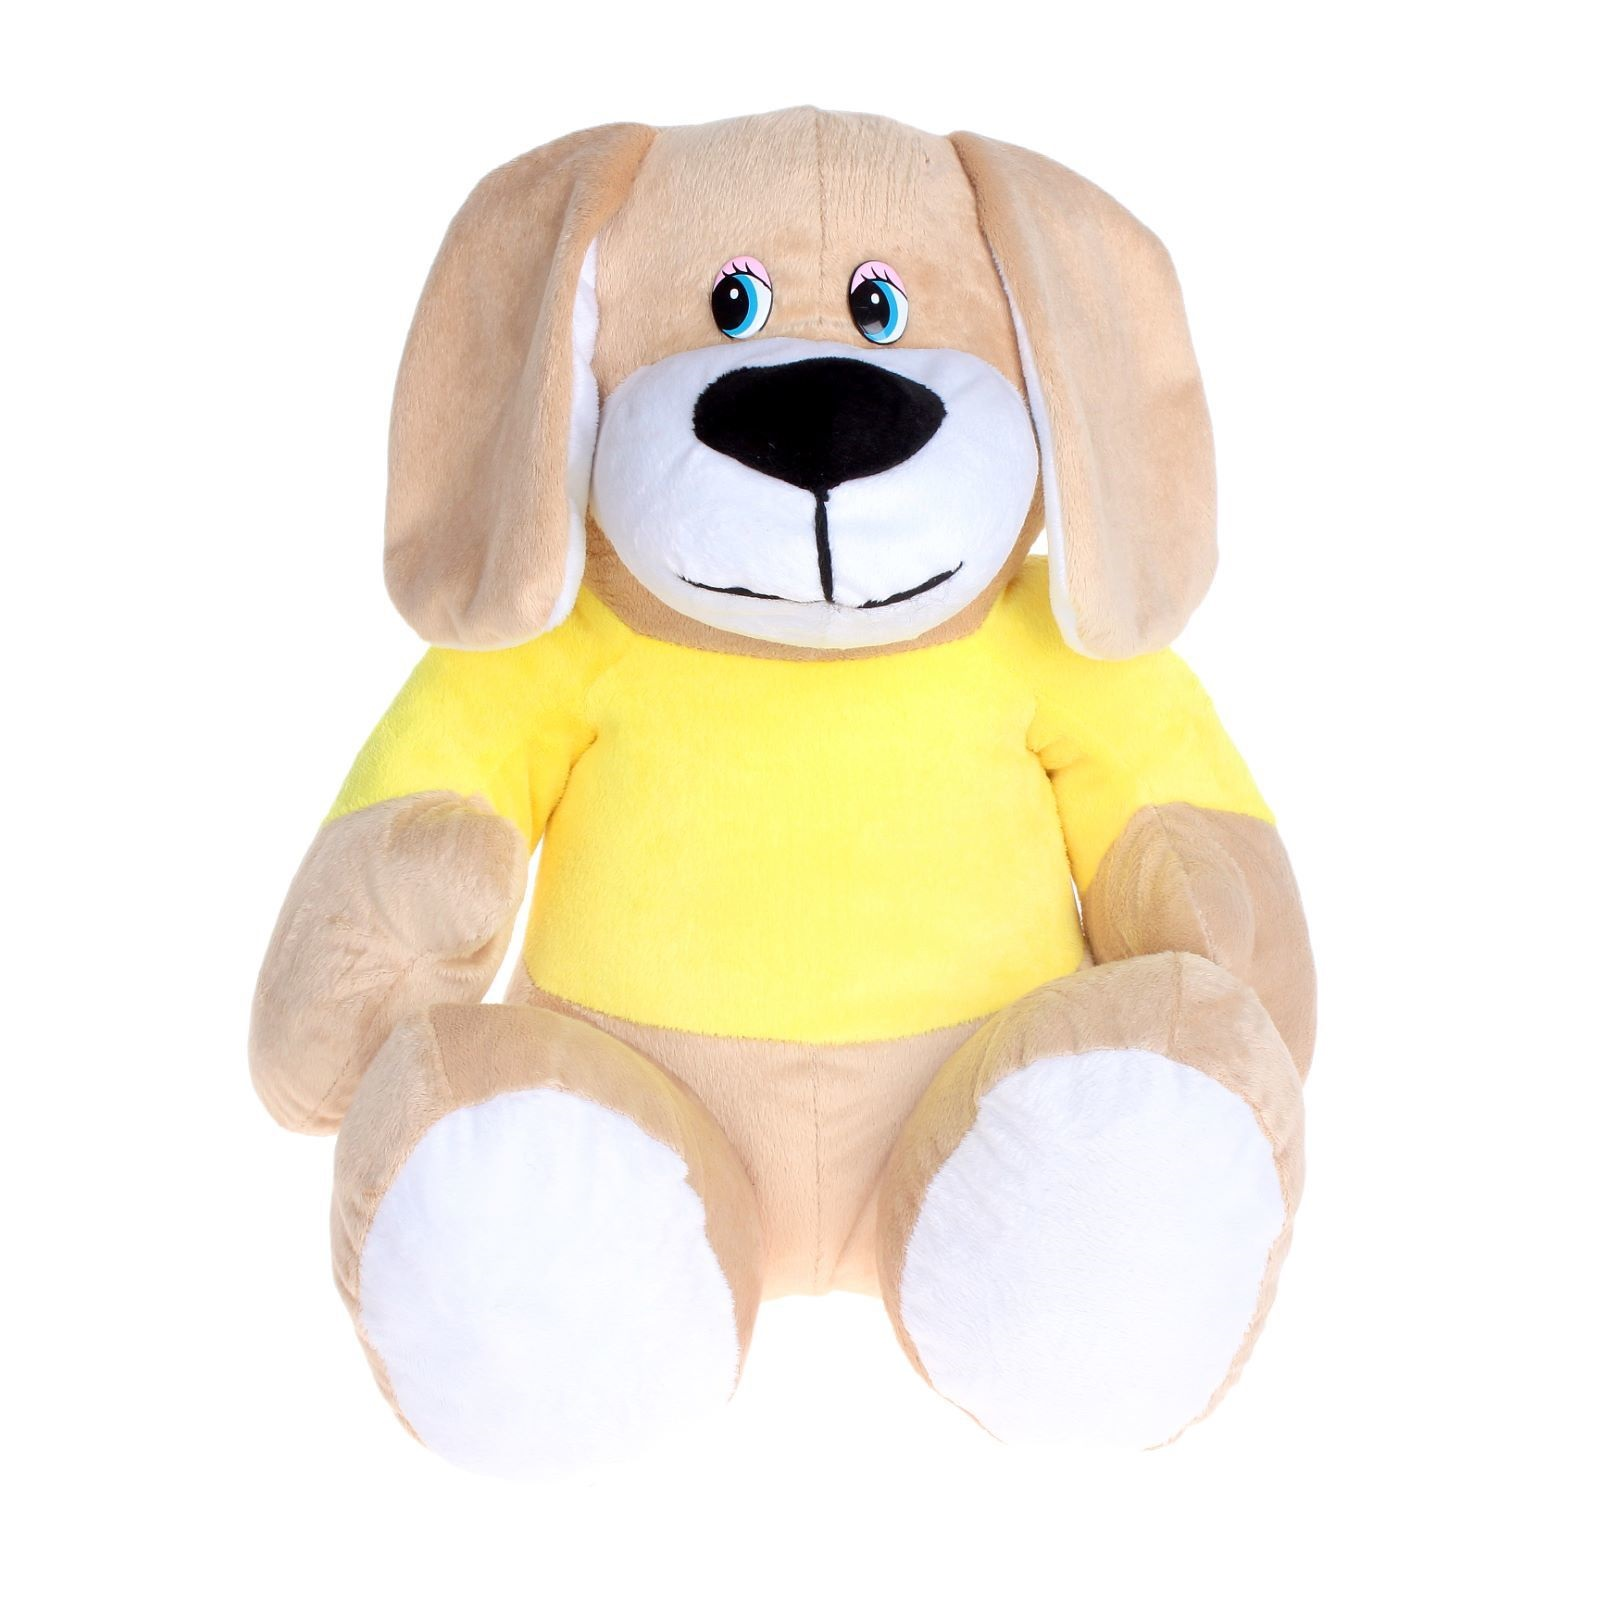 Мягкая игрушка Аймид Собачка Шарик , 652-374 sima land мягкая игрушка собачка шарик 14 см